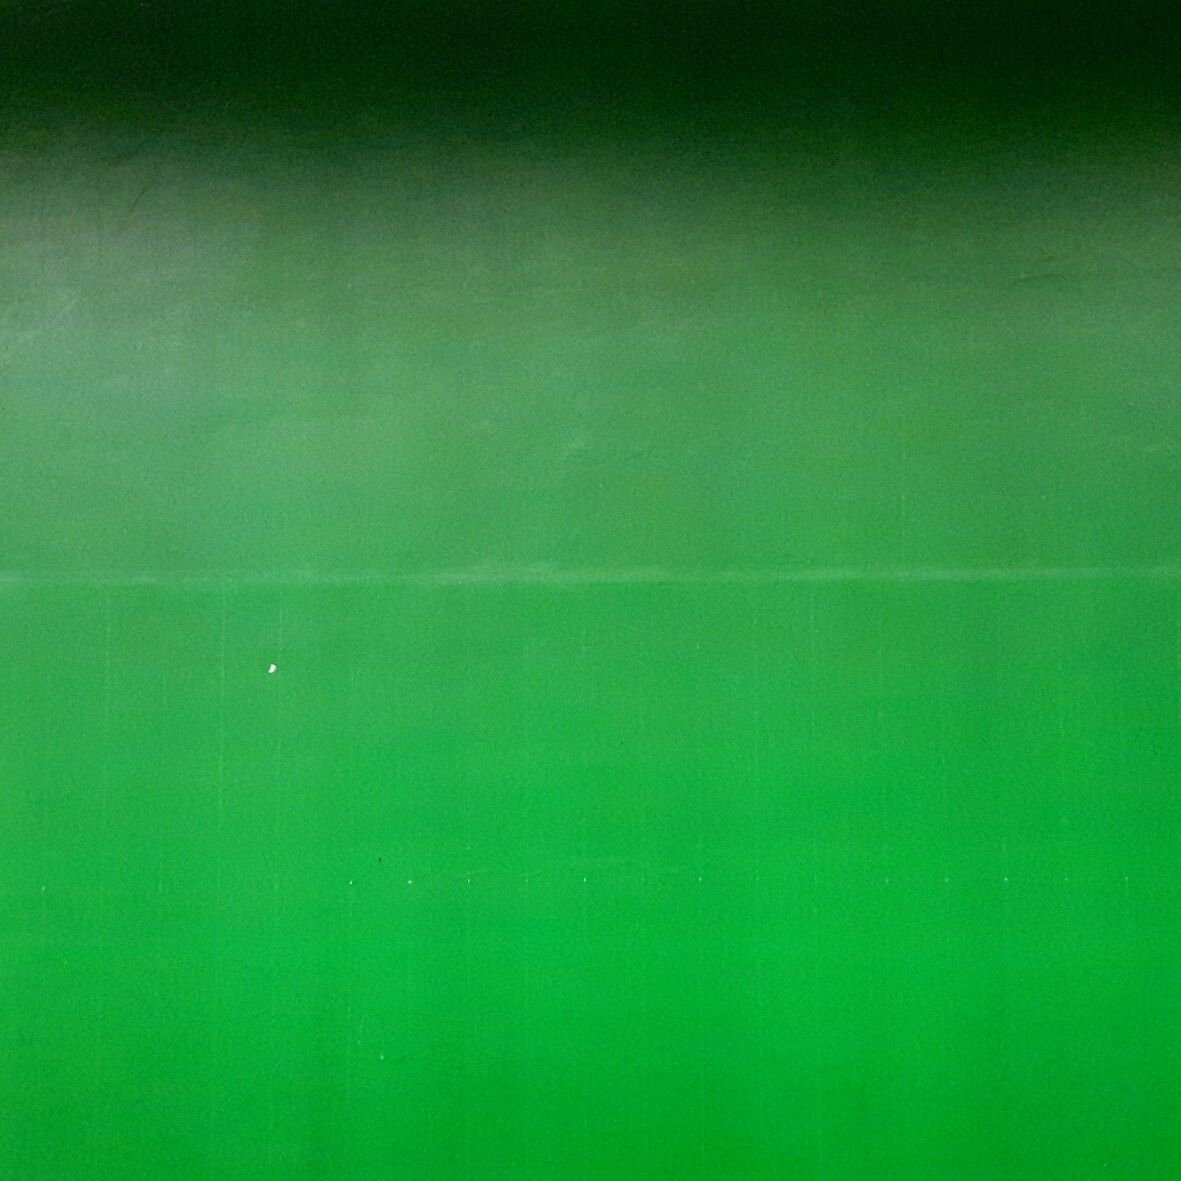 Lignes vertes sur fond vert